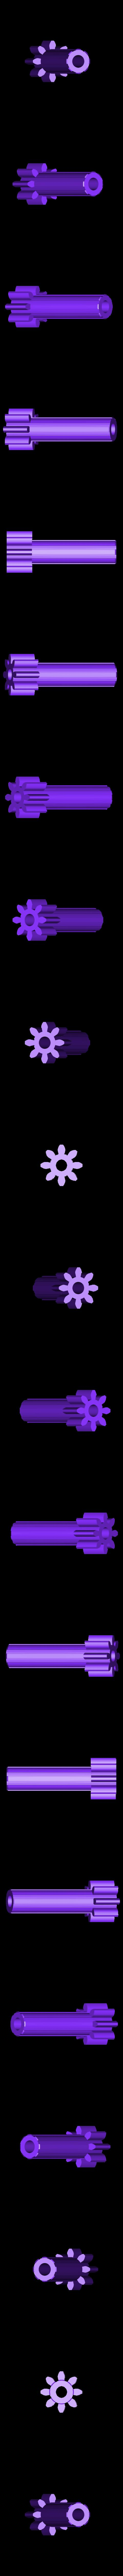 Reduction-Gear01a.stl Download free STL file Turboprop Engine • 3D printable model, konchan77